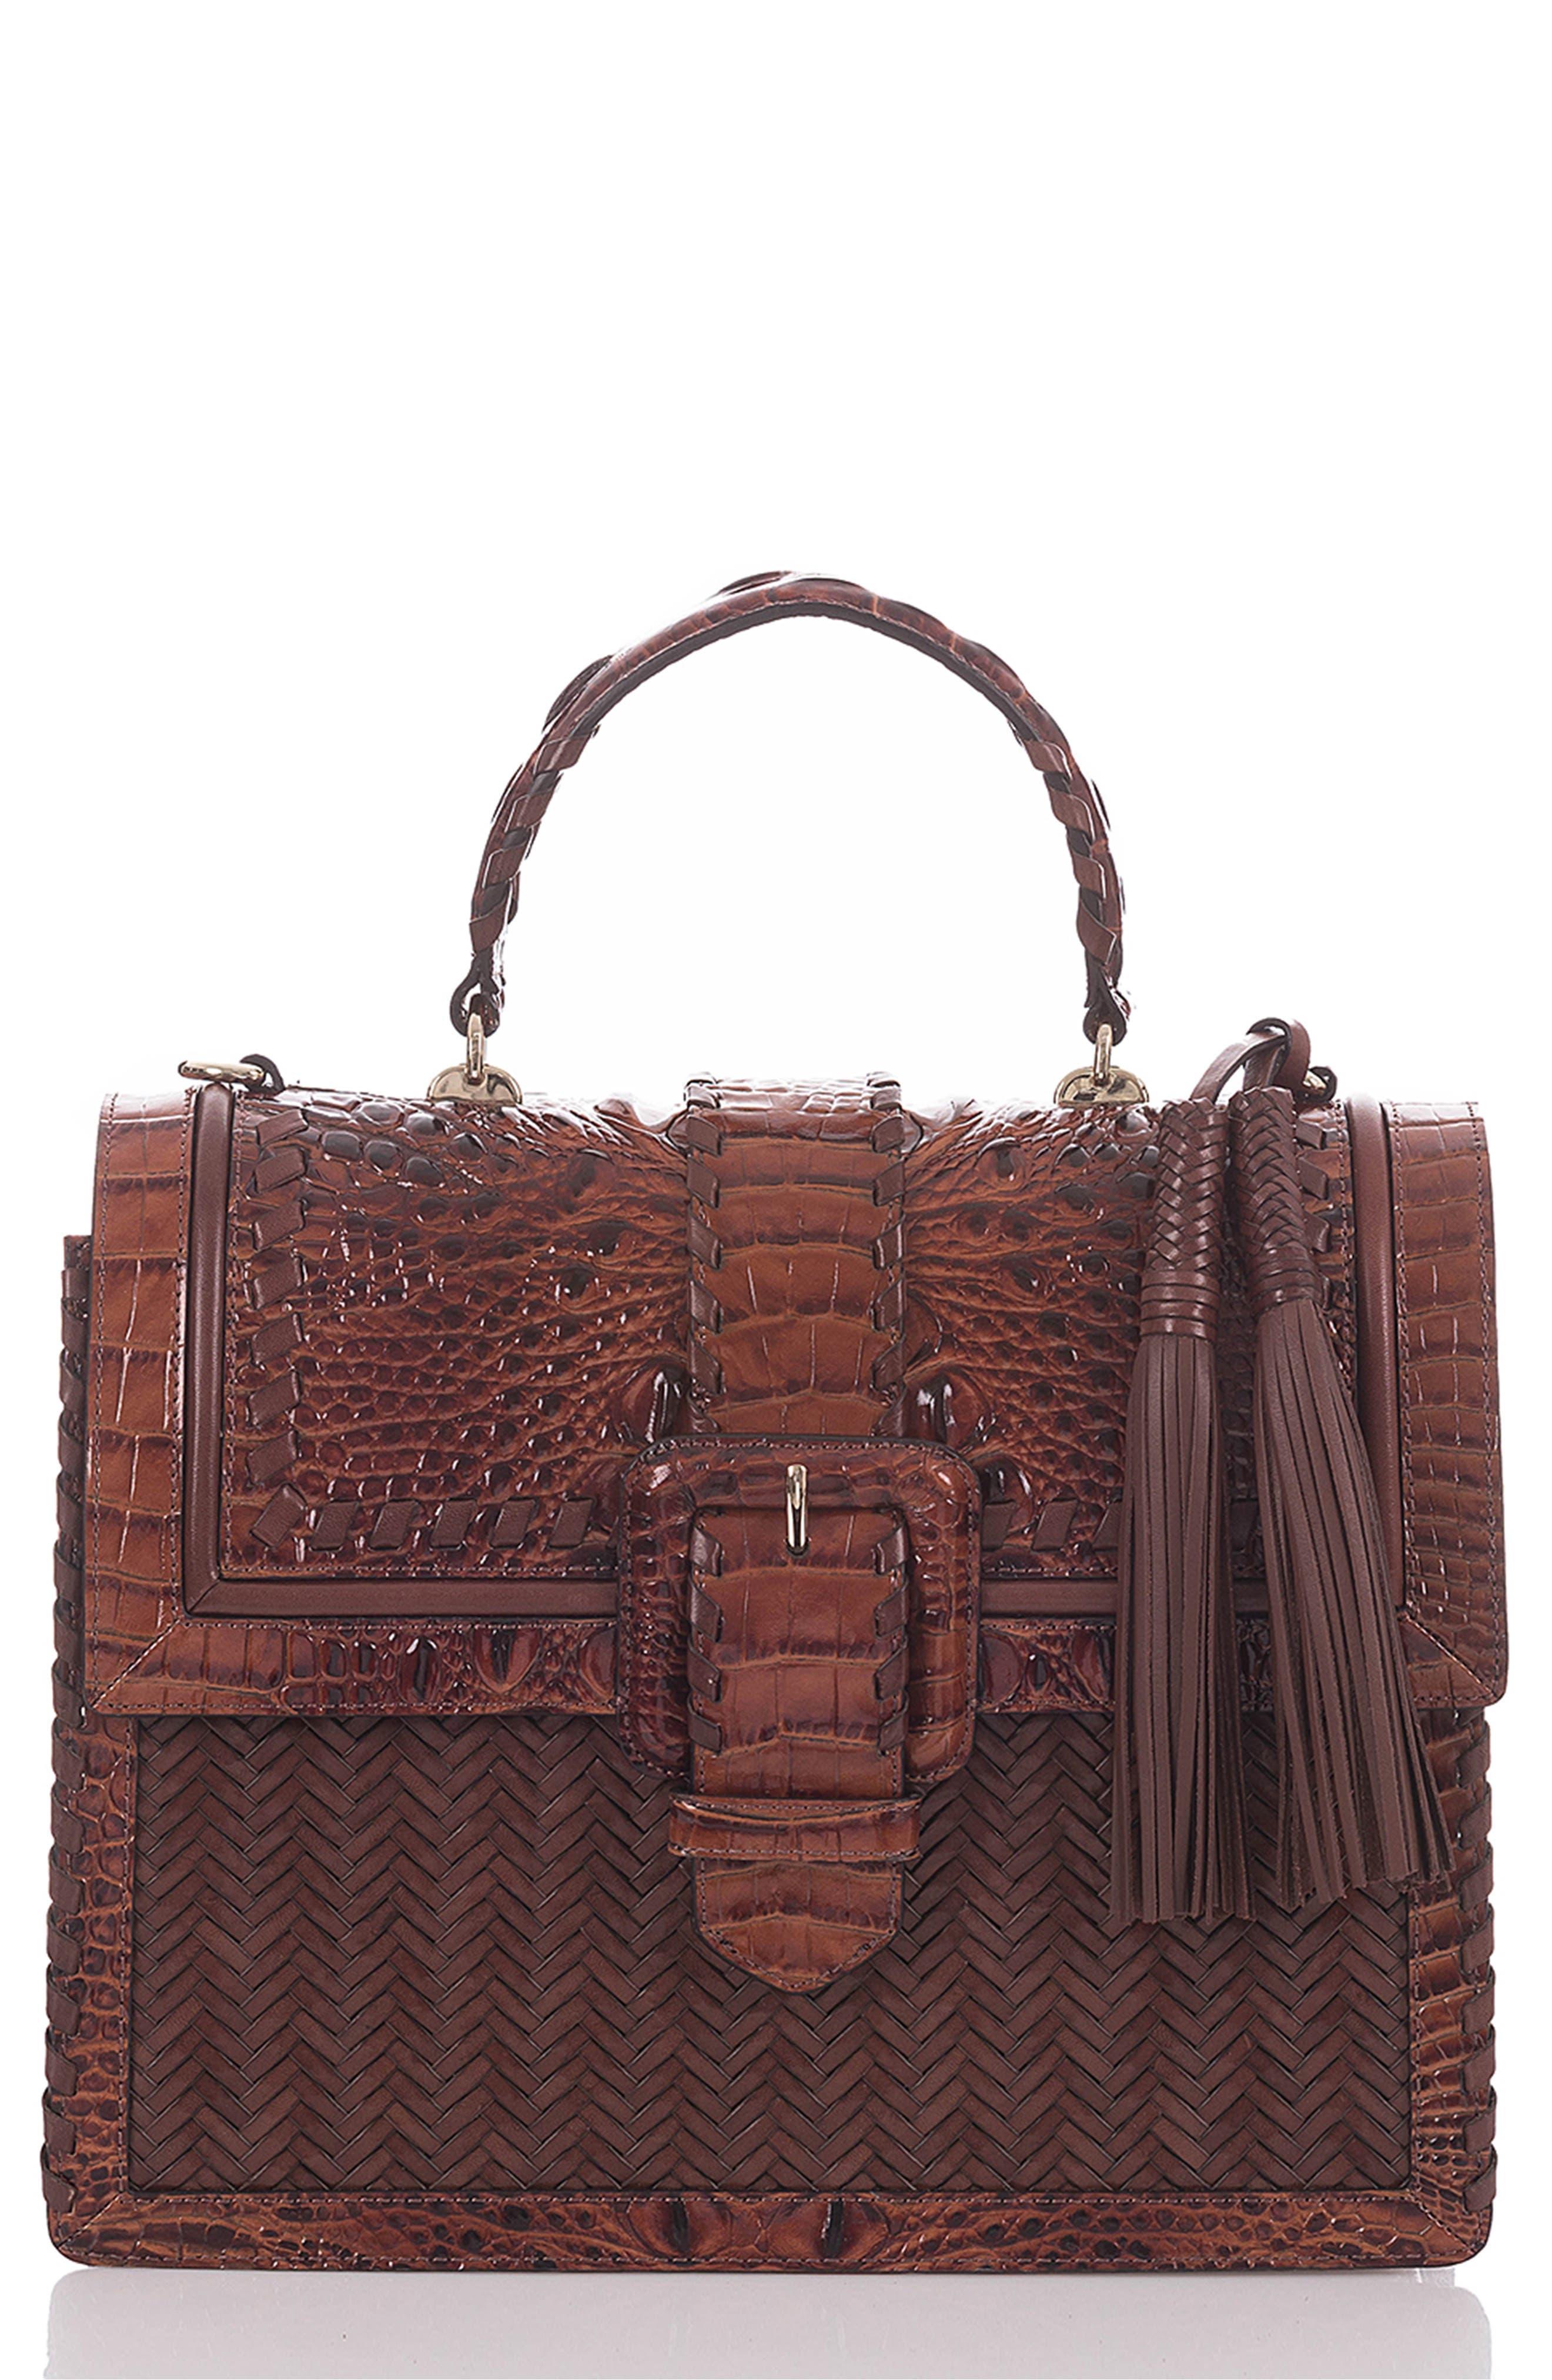 BRAHMIN, Medium Francine Croc Embossed & Woven Leather Satchel, Main thumbnail 1, color, 200